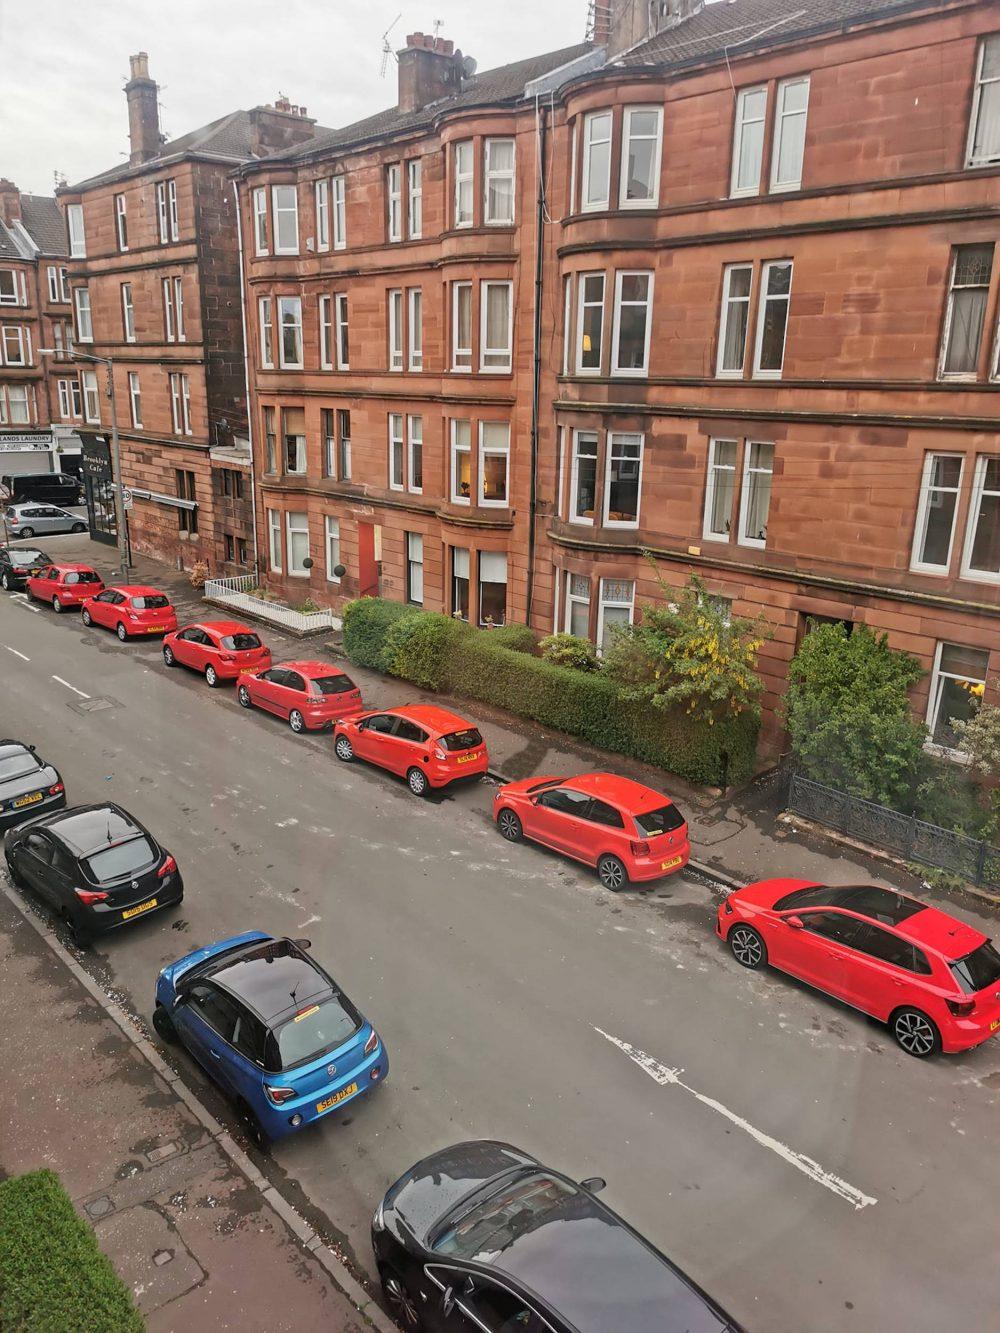 Bizarre scene spotted on Glasgow Street - Scottish Entertainment News